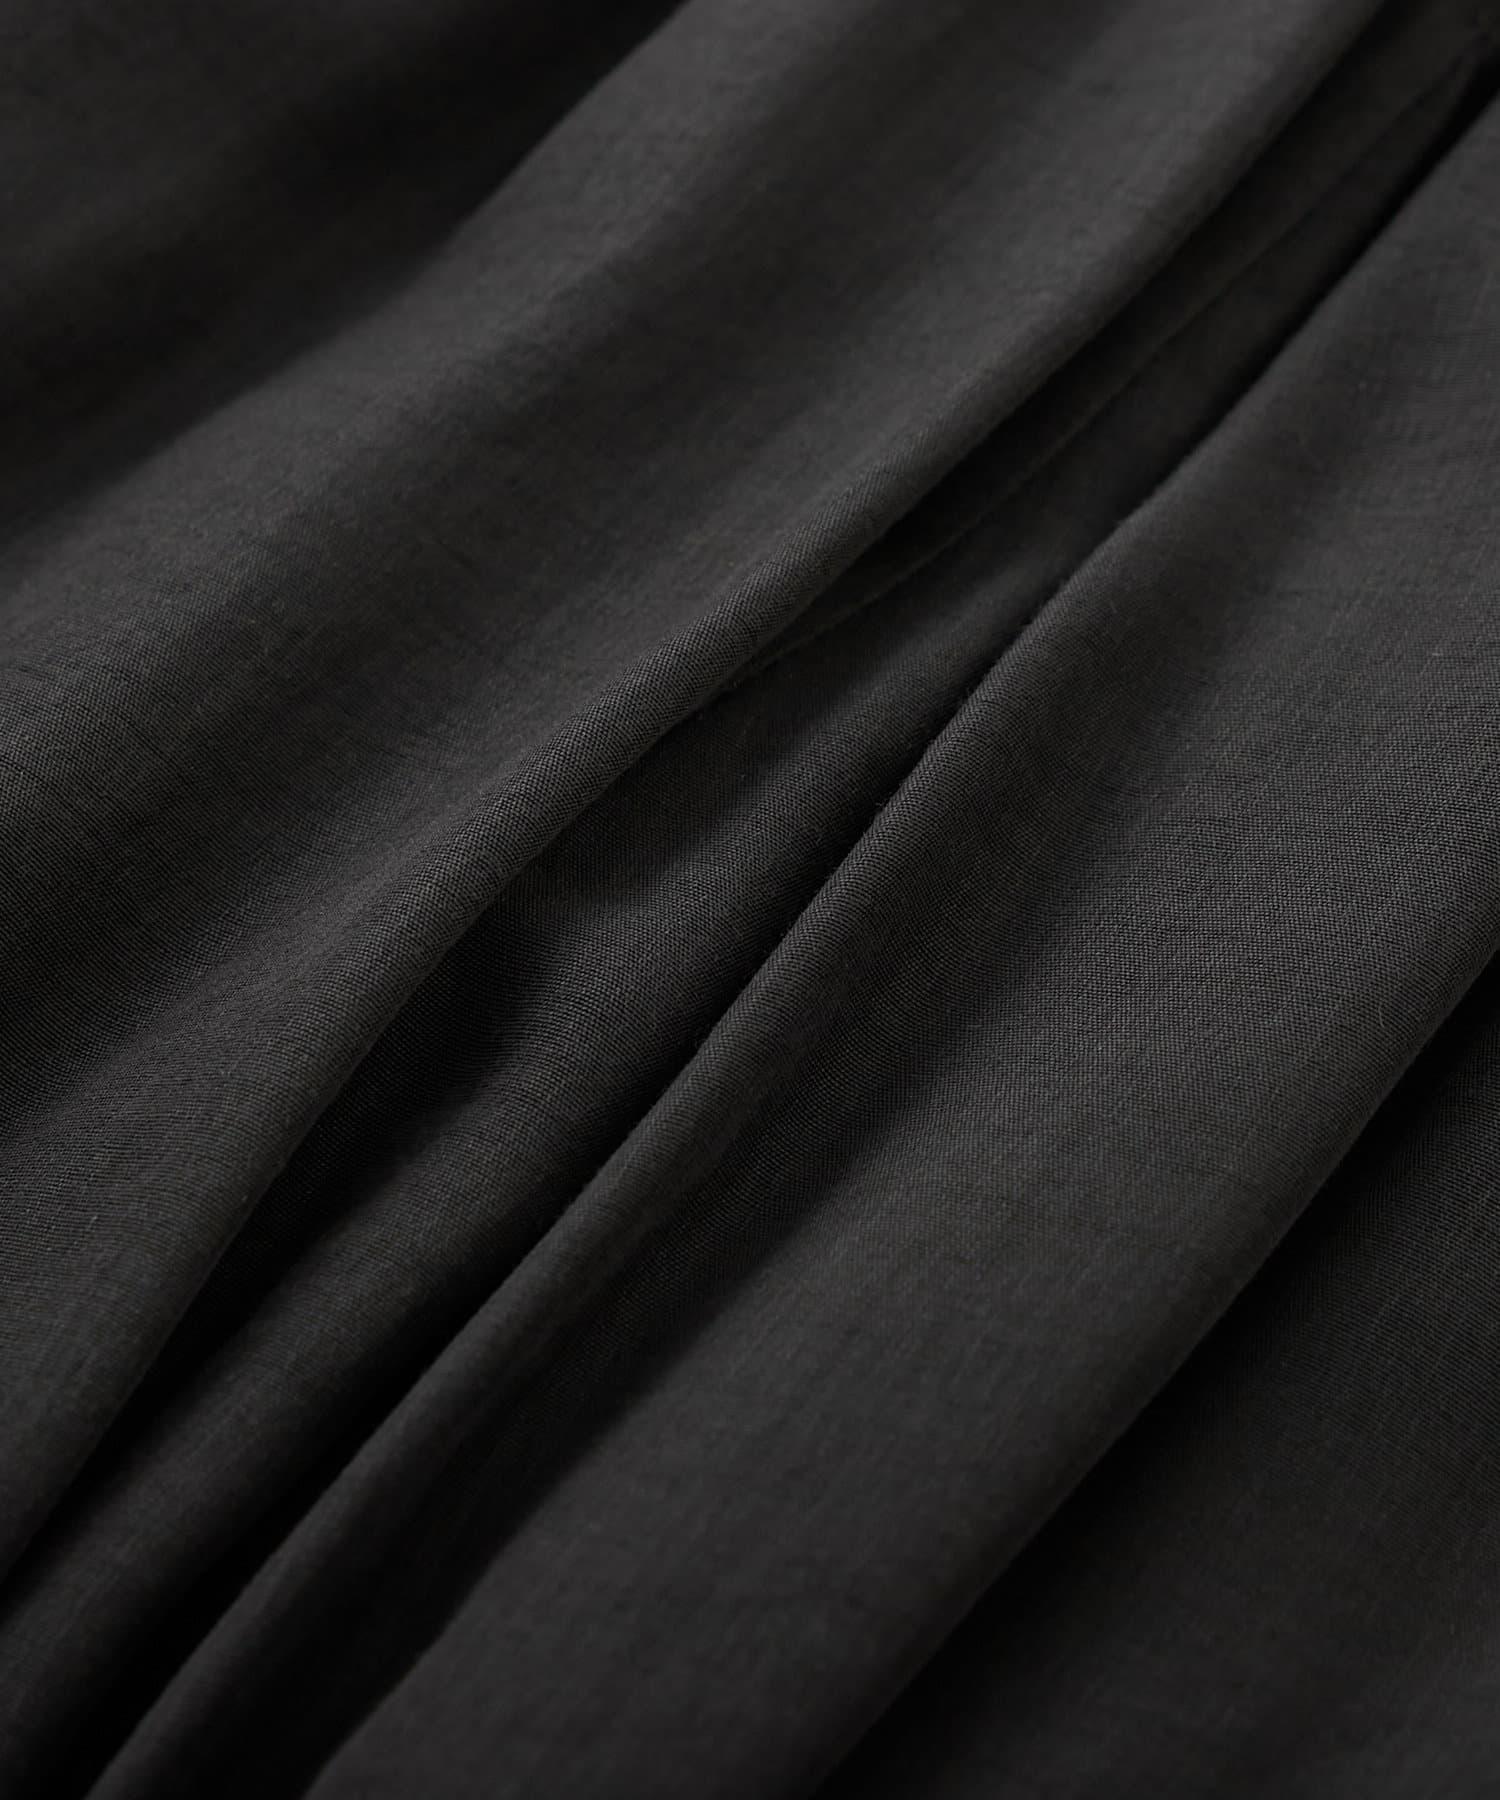 RIVE DROITE(リヴドロワ) 【軽やかな着心地】マチフレアースカート